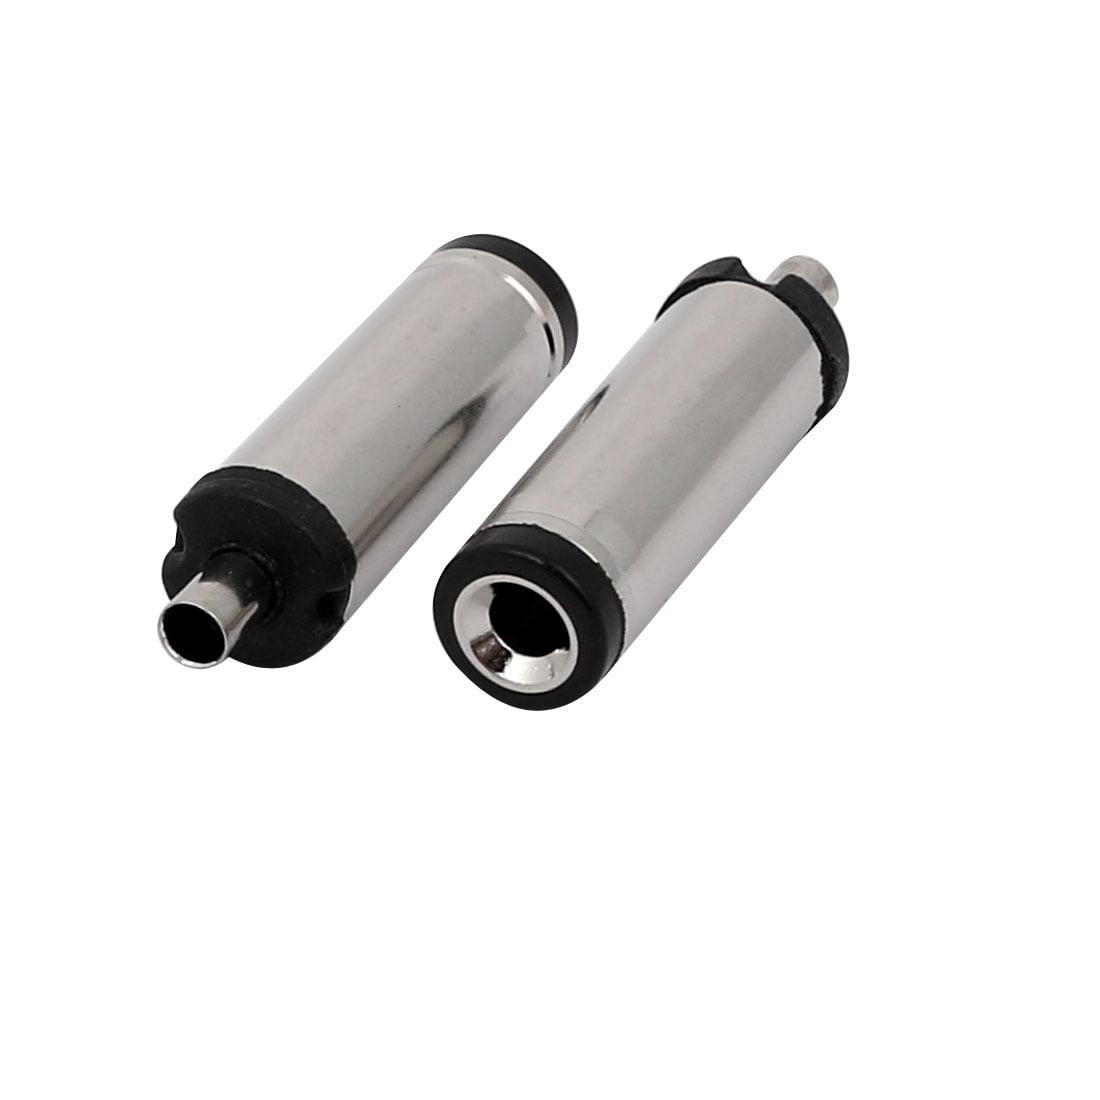 5 Pcs 5521CV205 5.5mm x 2.1mm DC Power Adapter Jack Male Bucket Connector - image 1 de 2